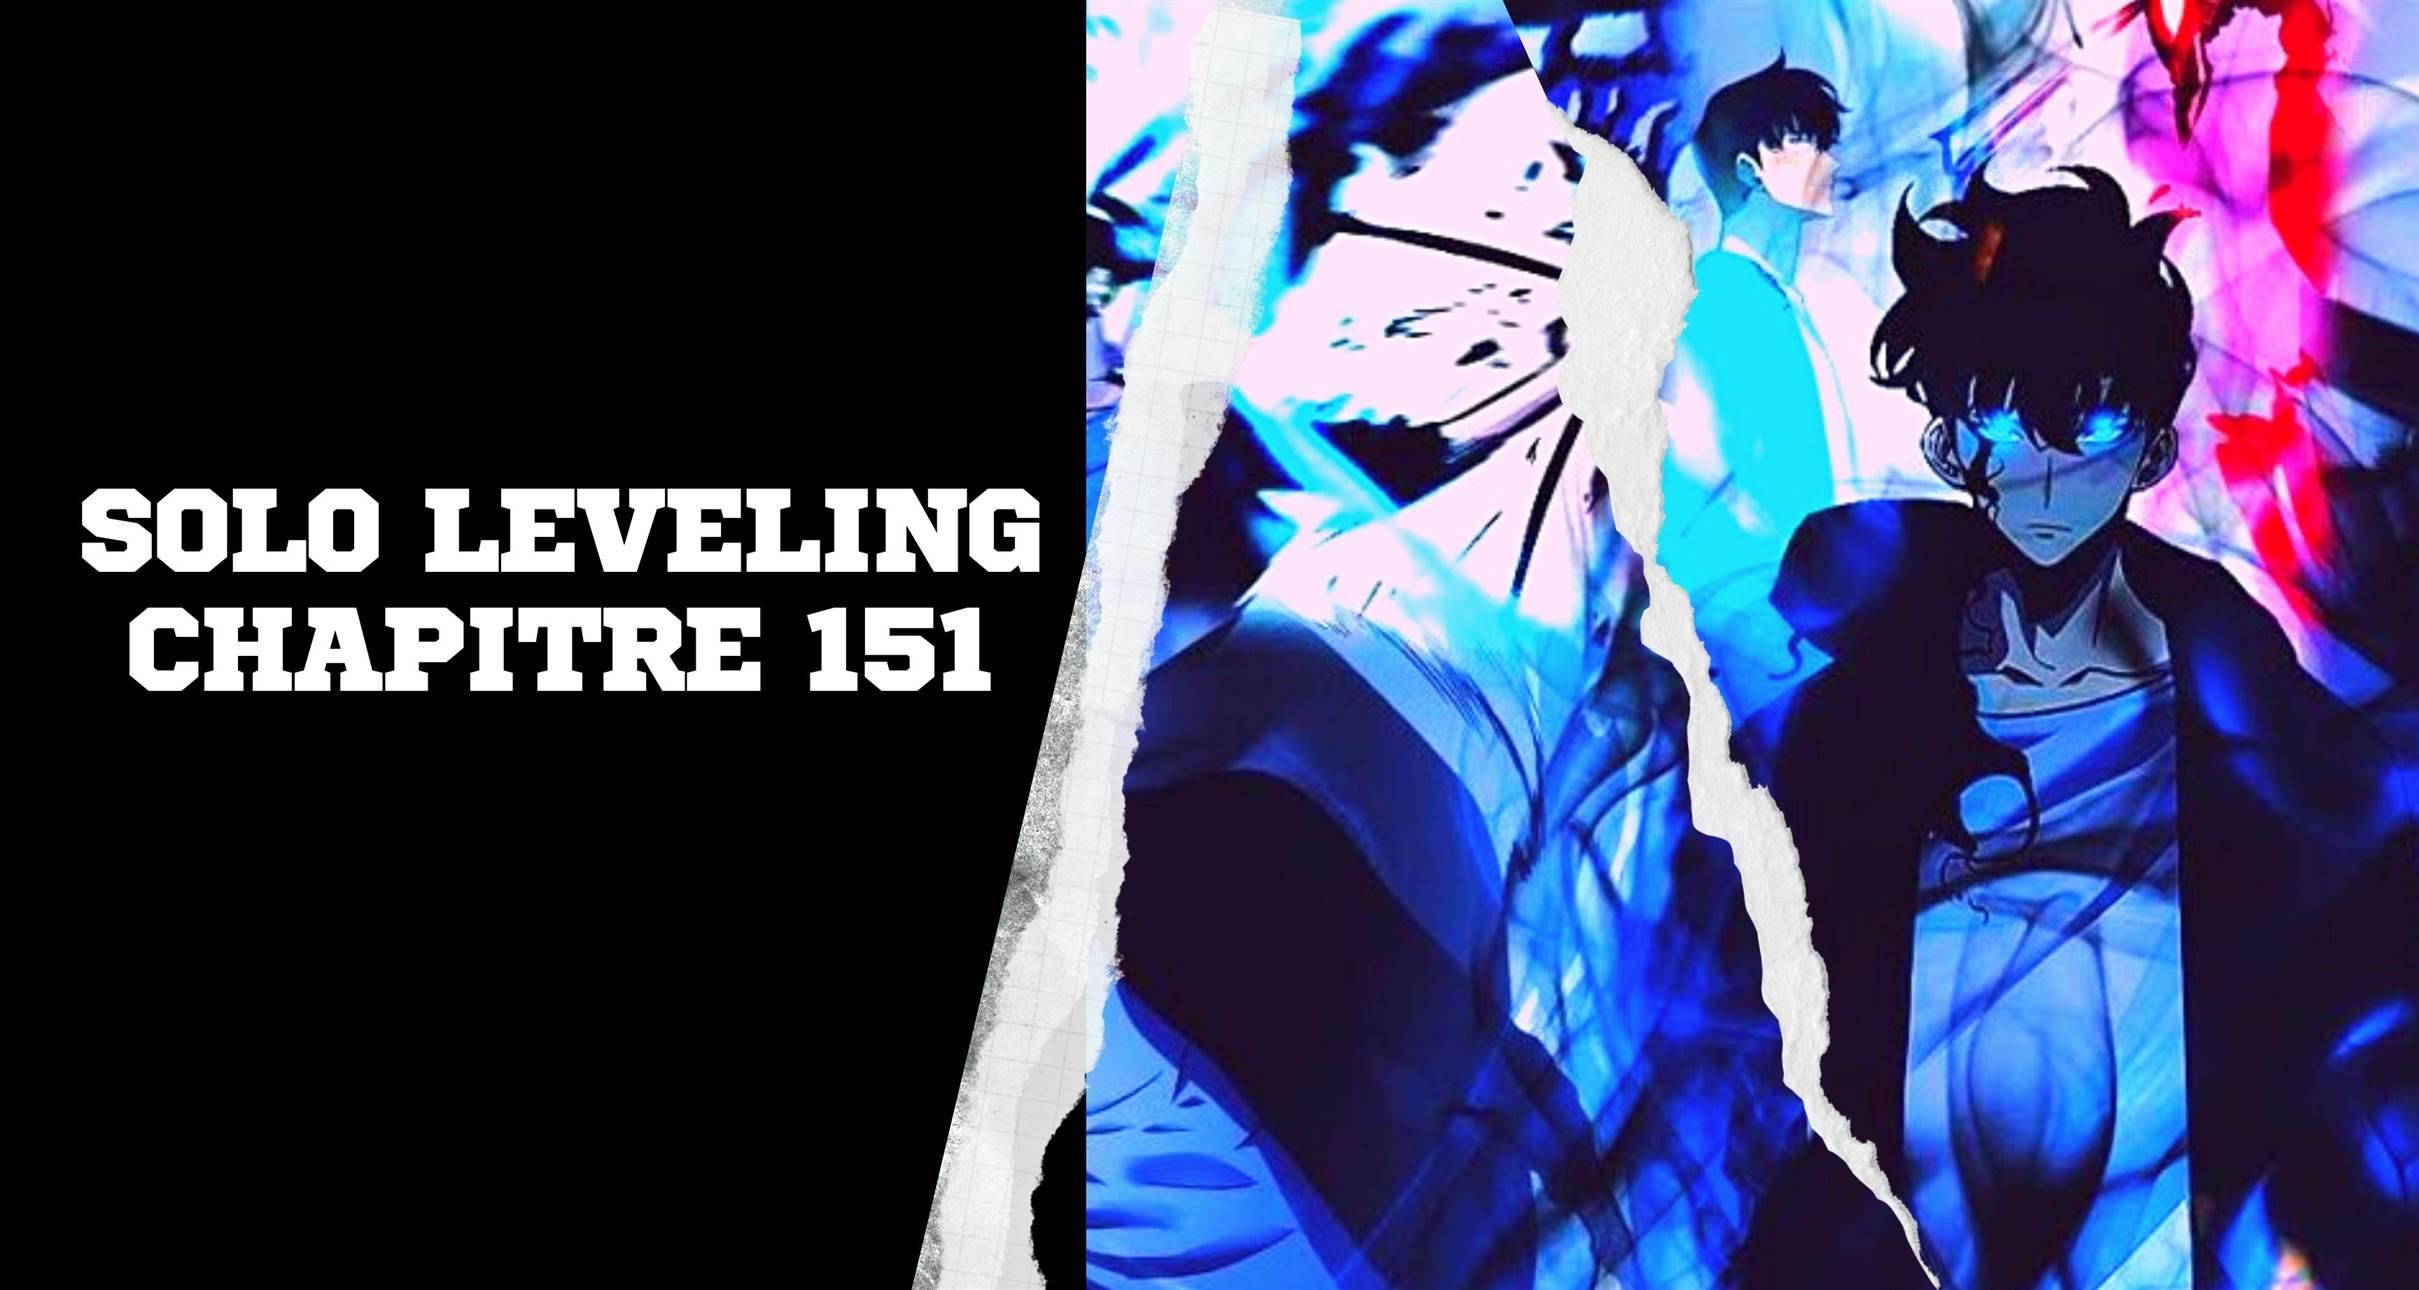 Solo Leveling Chapitre 151 Date de sortie